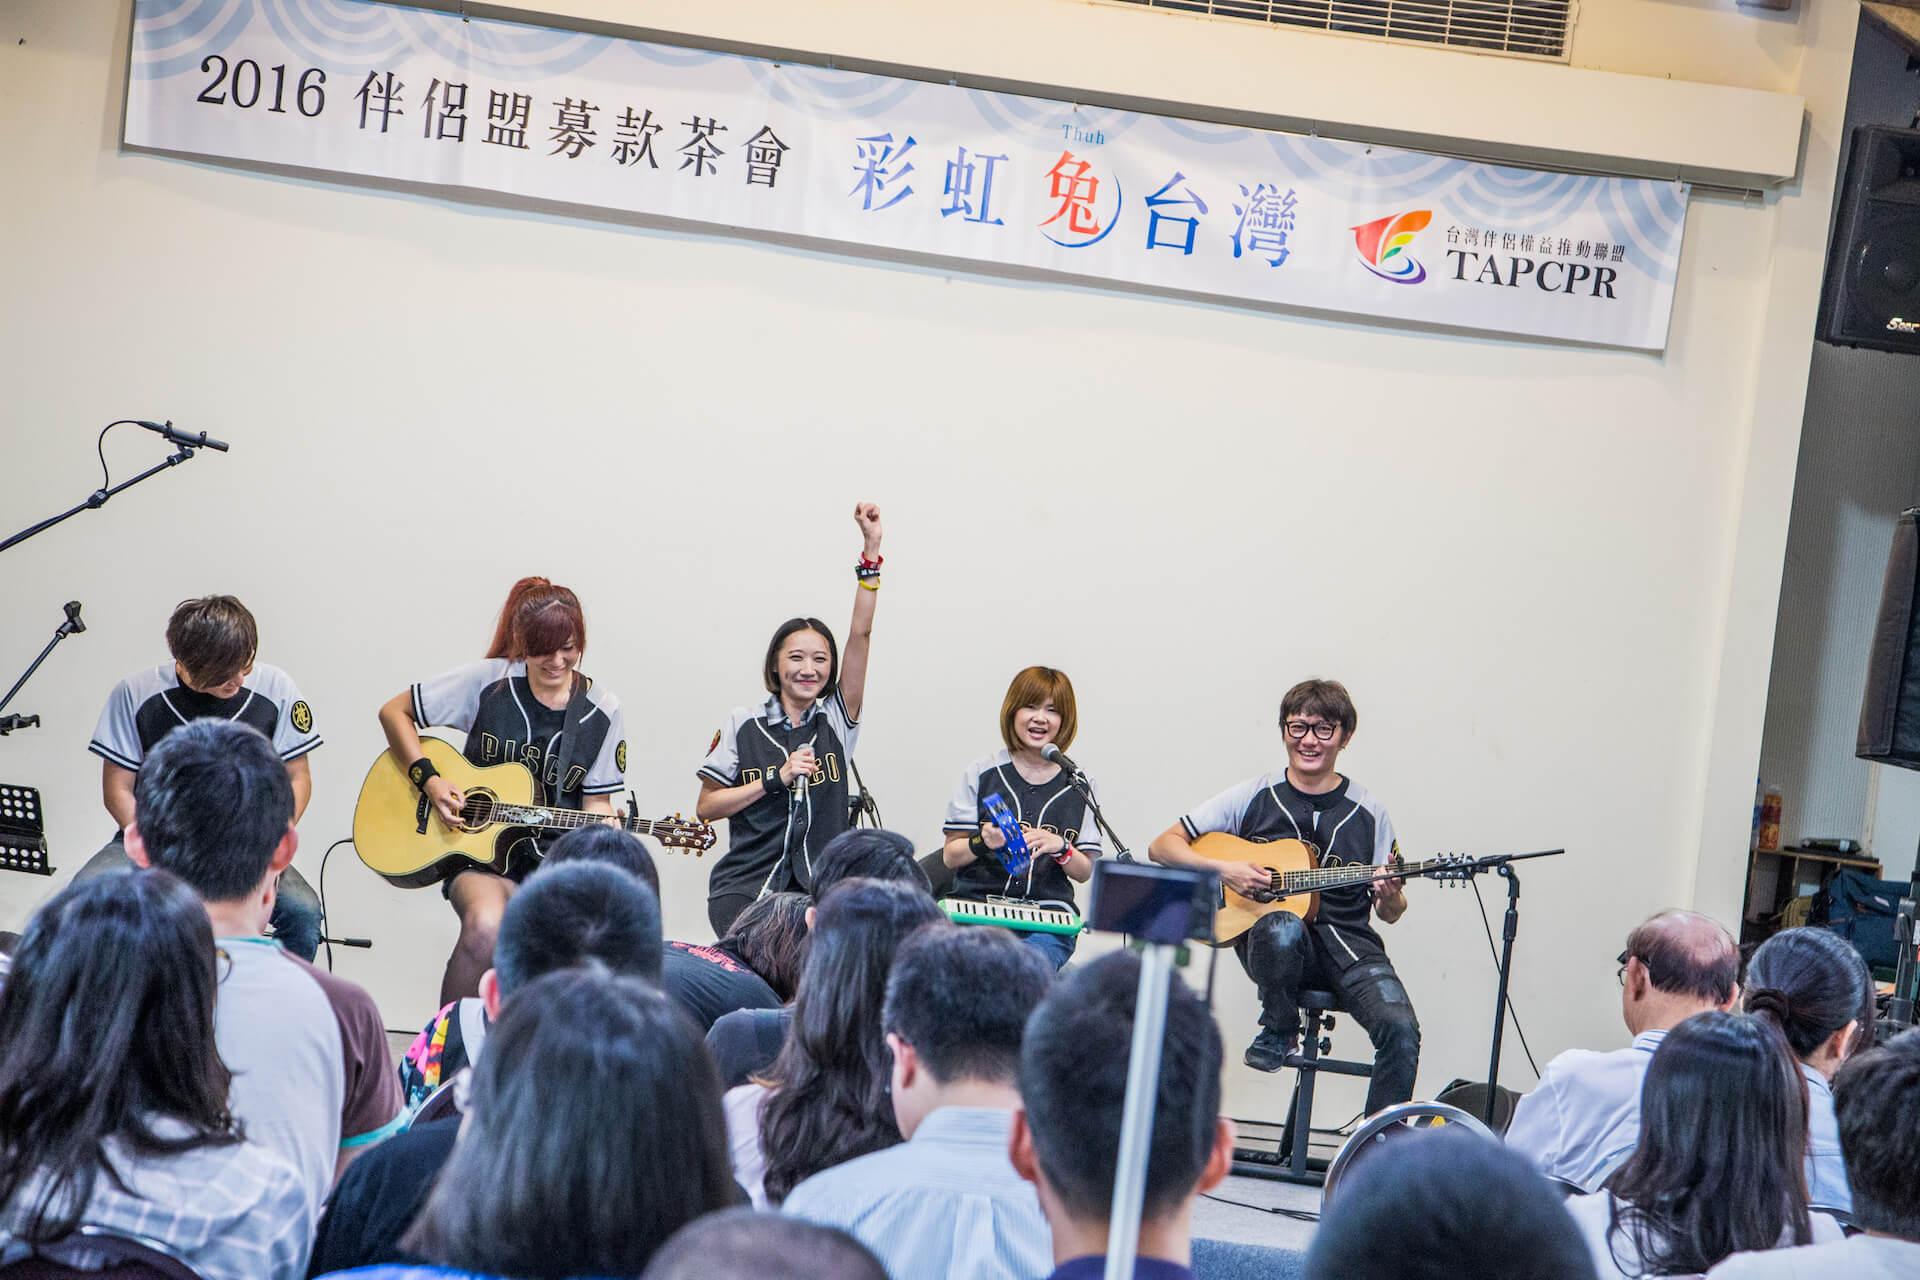 LGBTの仲間たちに、希望や勇気を届けたいー台湾音楽シーンと、性的マイノリティのかかわり image03